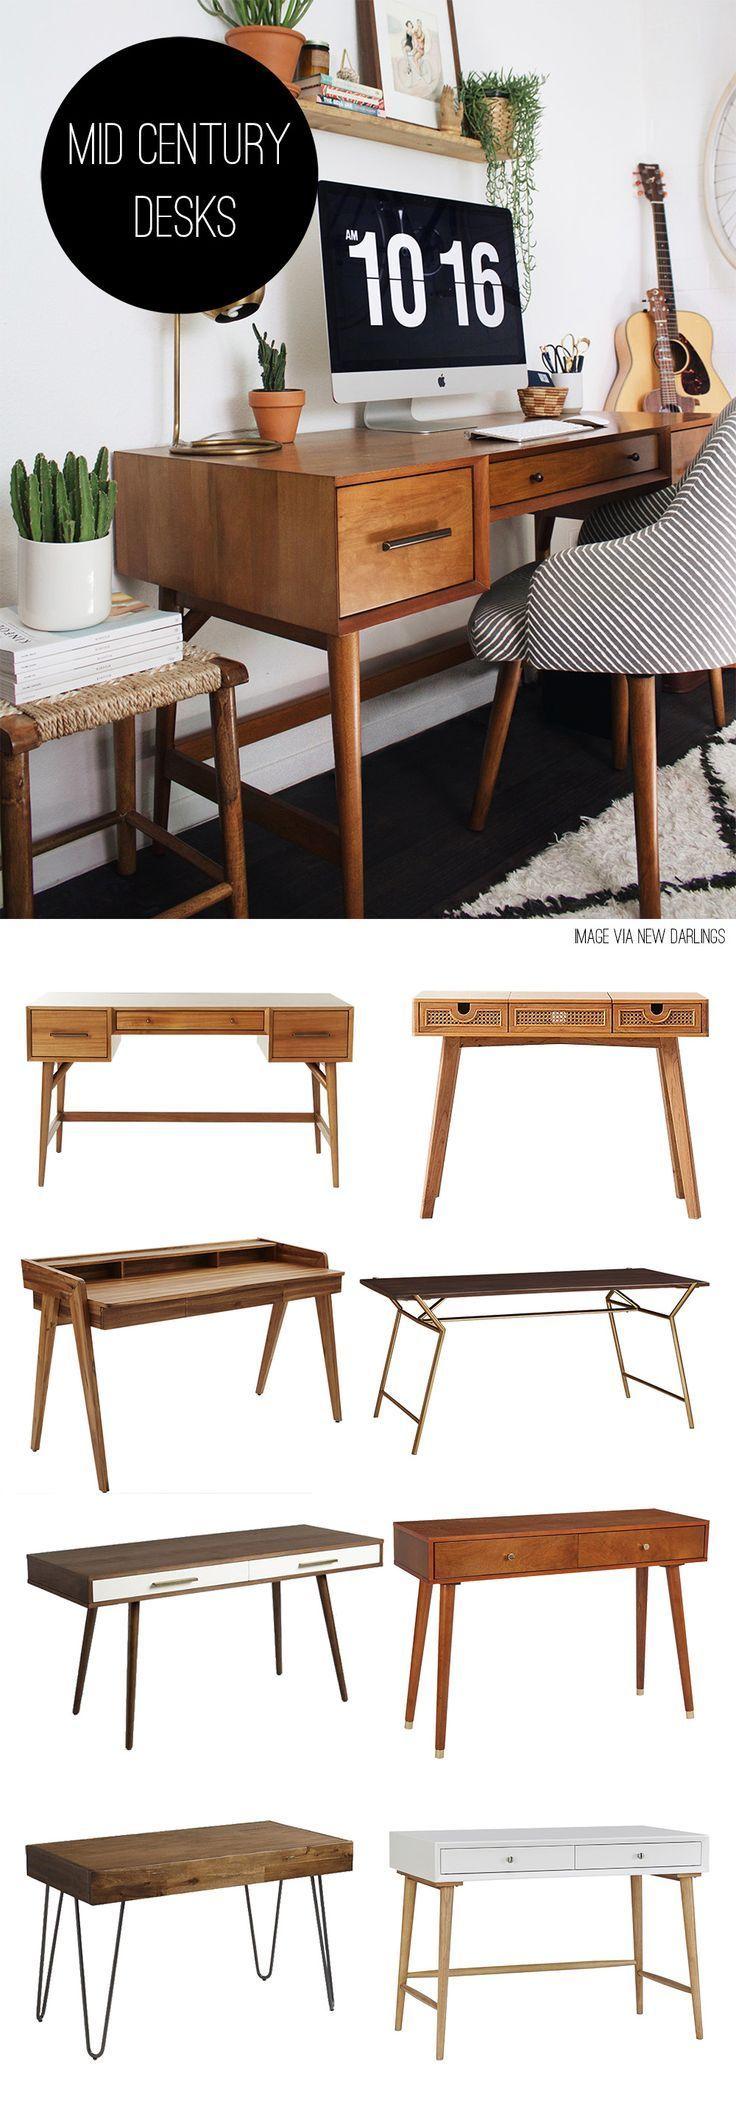 Mid Century Desks - House One -  Mid Century Desks – House One  - #AsianDecorations #BeautifulBedrooms #Century #Desks #FengShui #FrenchCountry #House #Mid #MidCenturyModern #ModernHouses